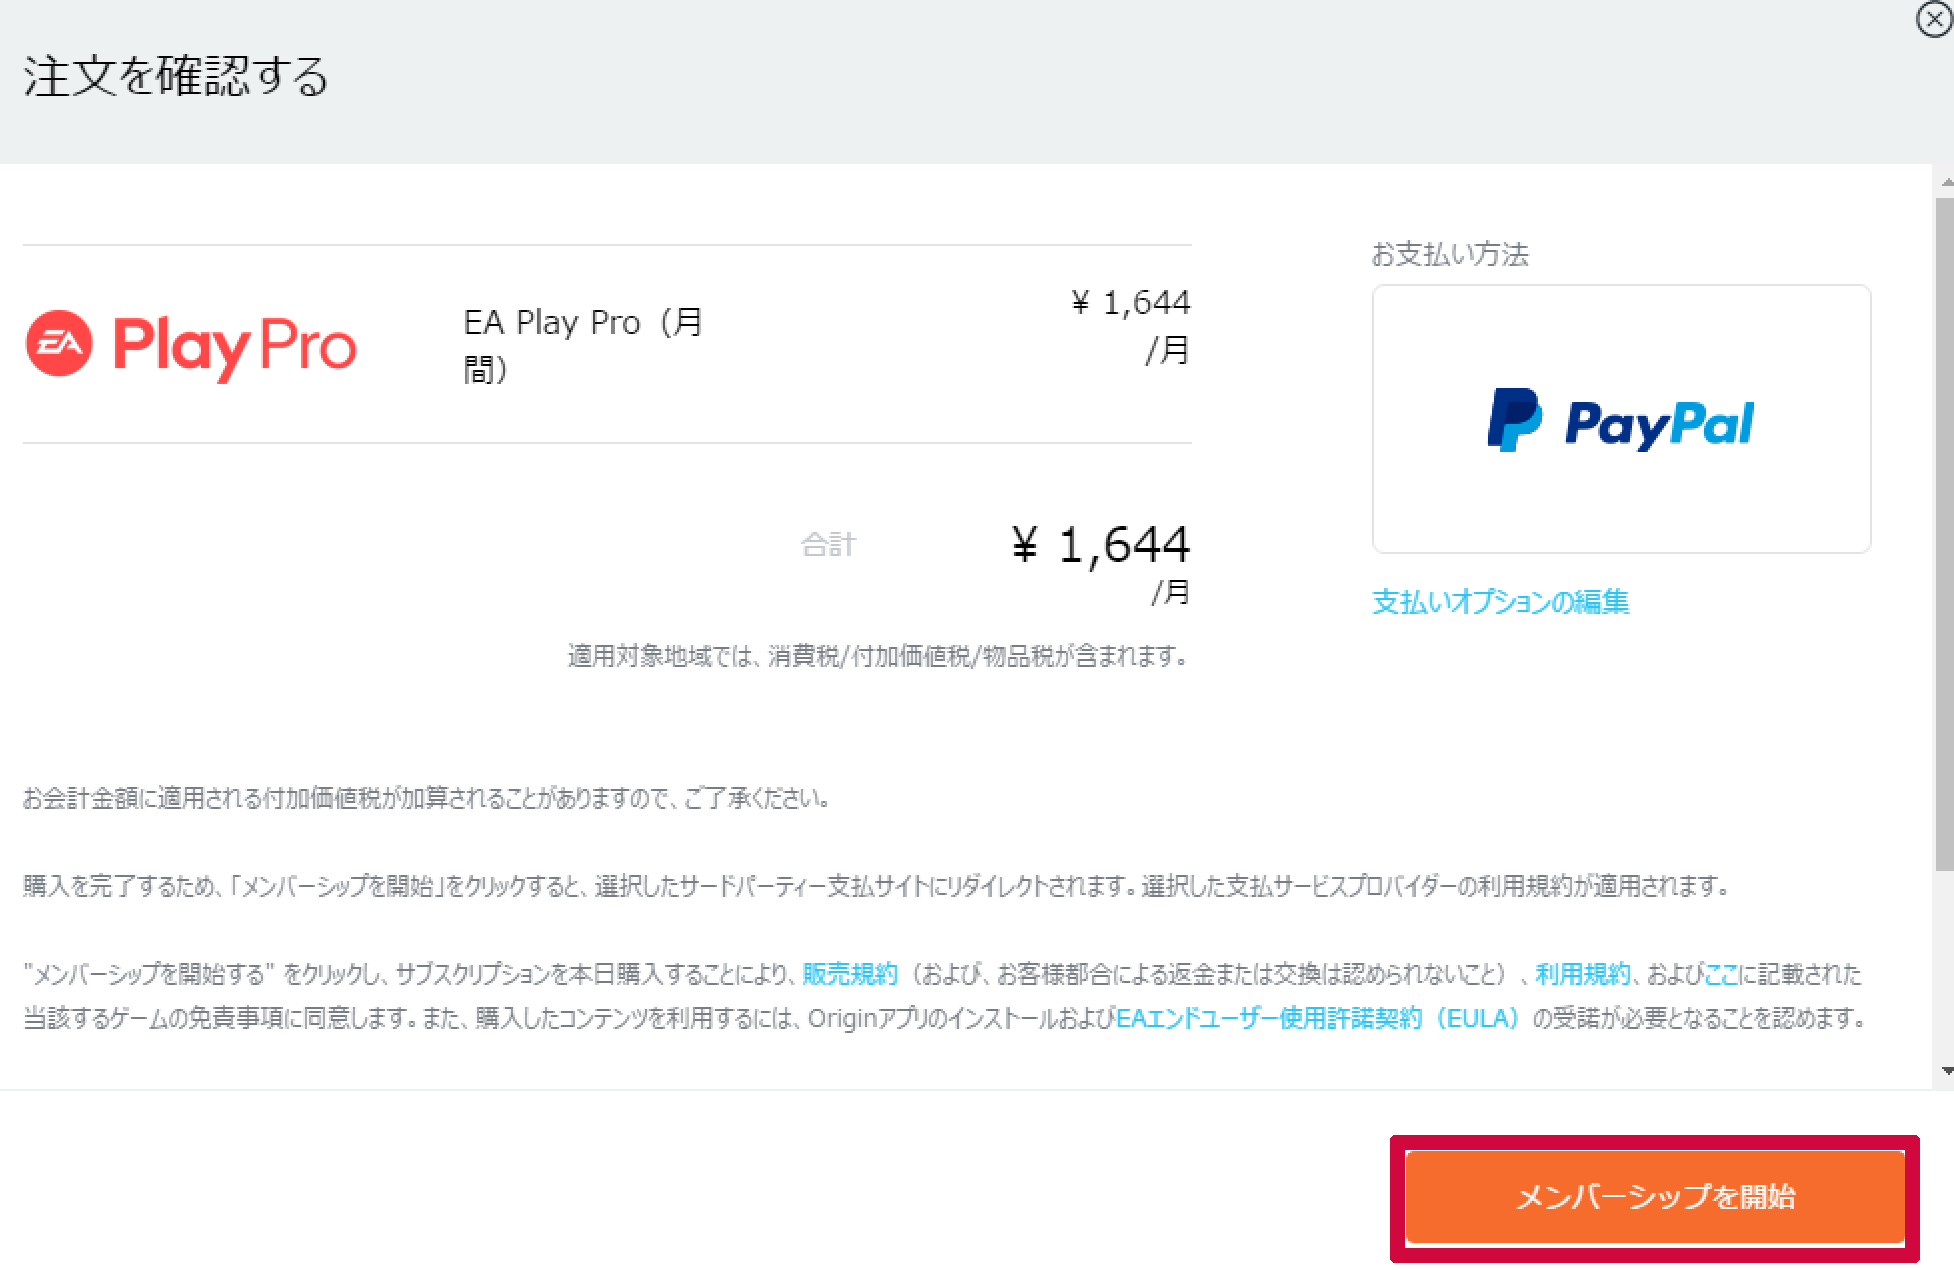 PayPalの場合は注文を確認するの画面が表示されるのでメンバーシップを開始をクリックする